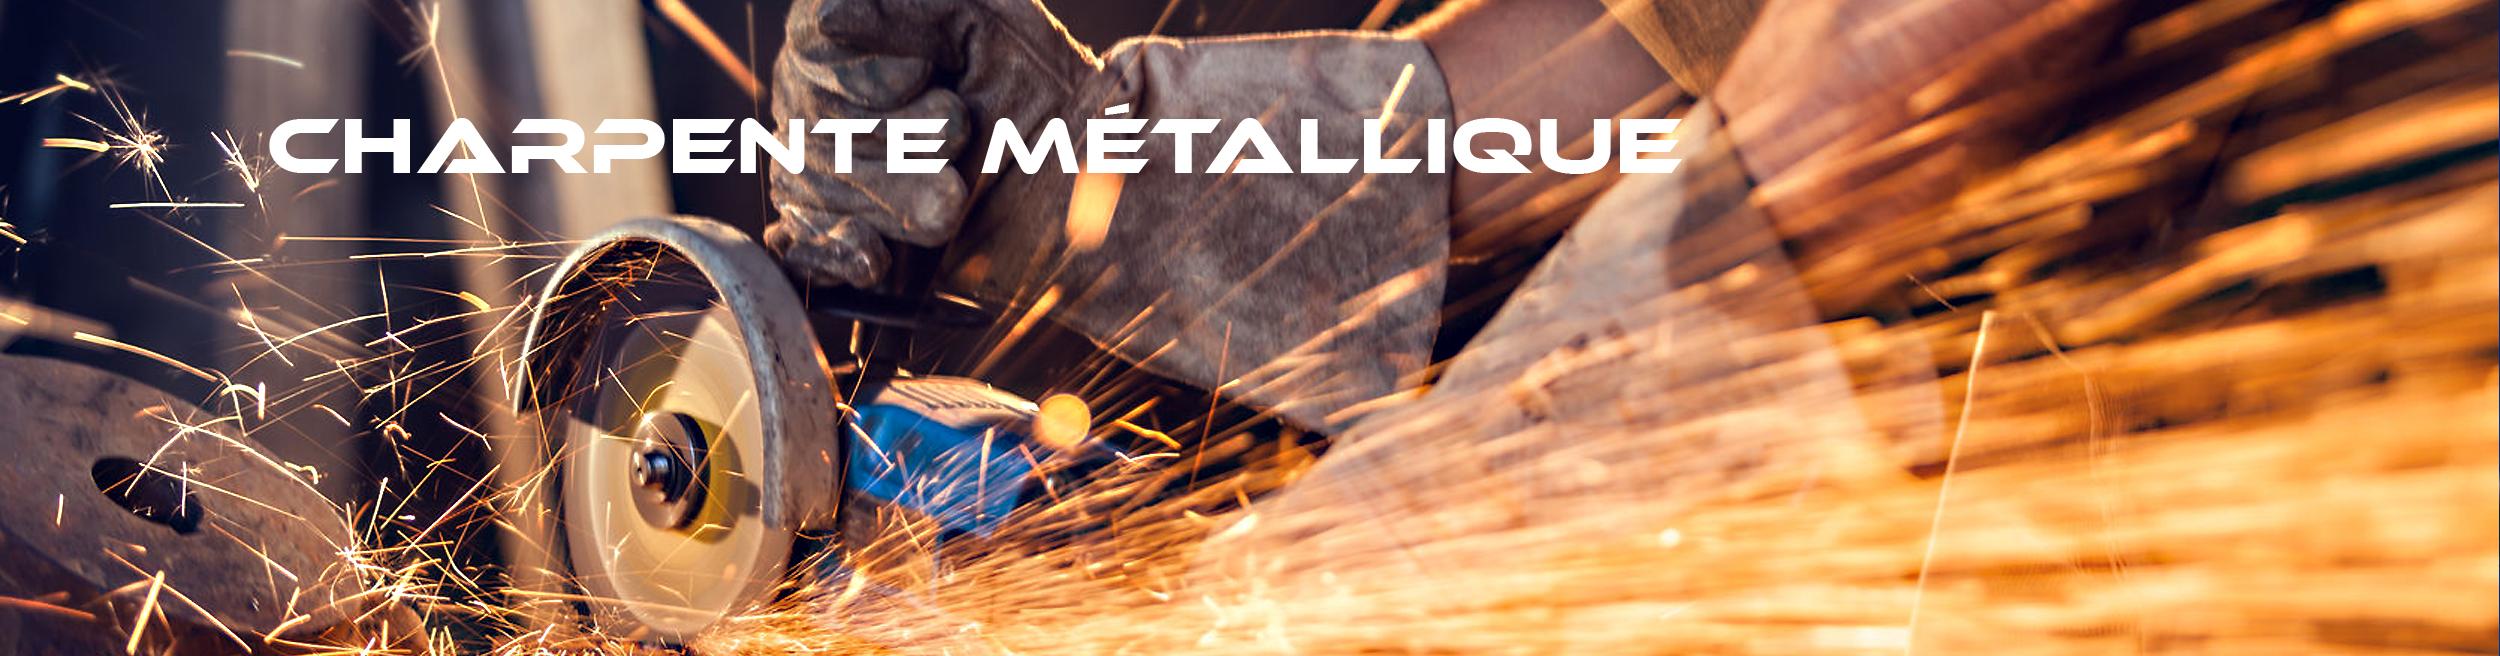 charpentre métallique